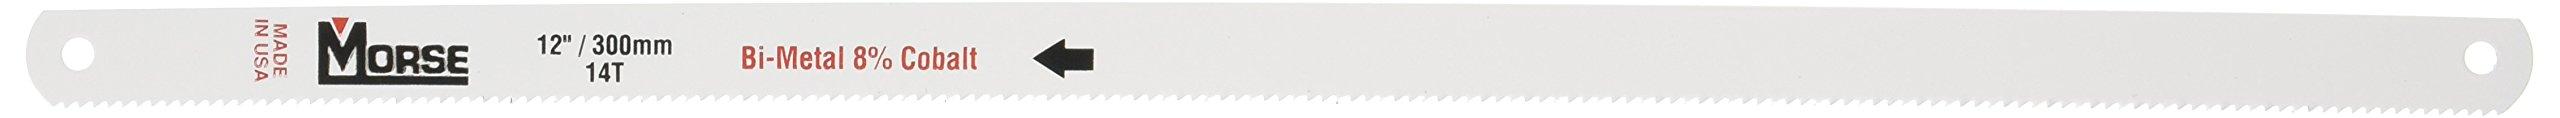 MK Morse HHCB1214-2 12'' Long 1/2'' Wide .025'' Thick 14 TPI Bi-Metal Hacksaw Blades, 2-Per Card